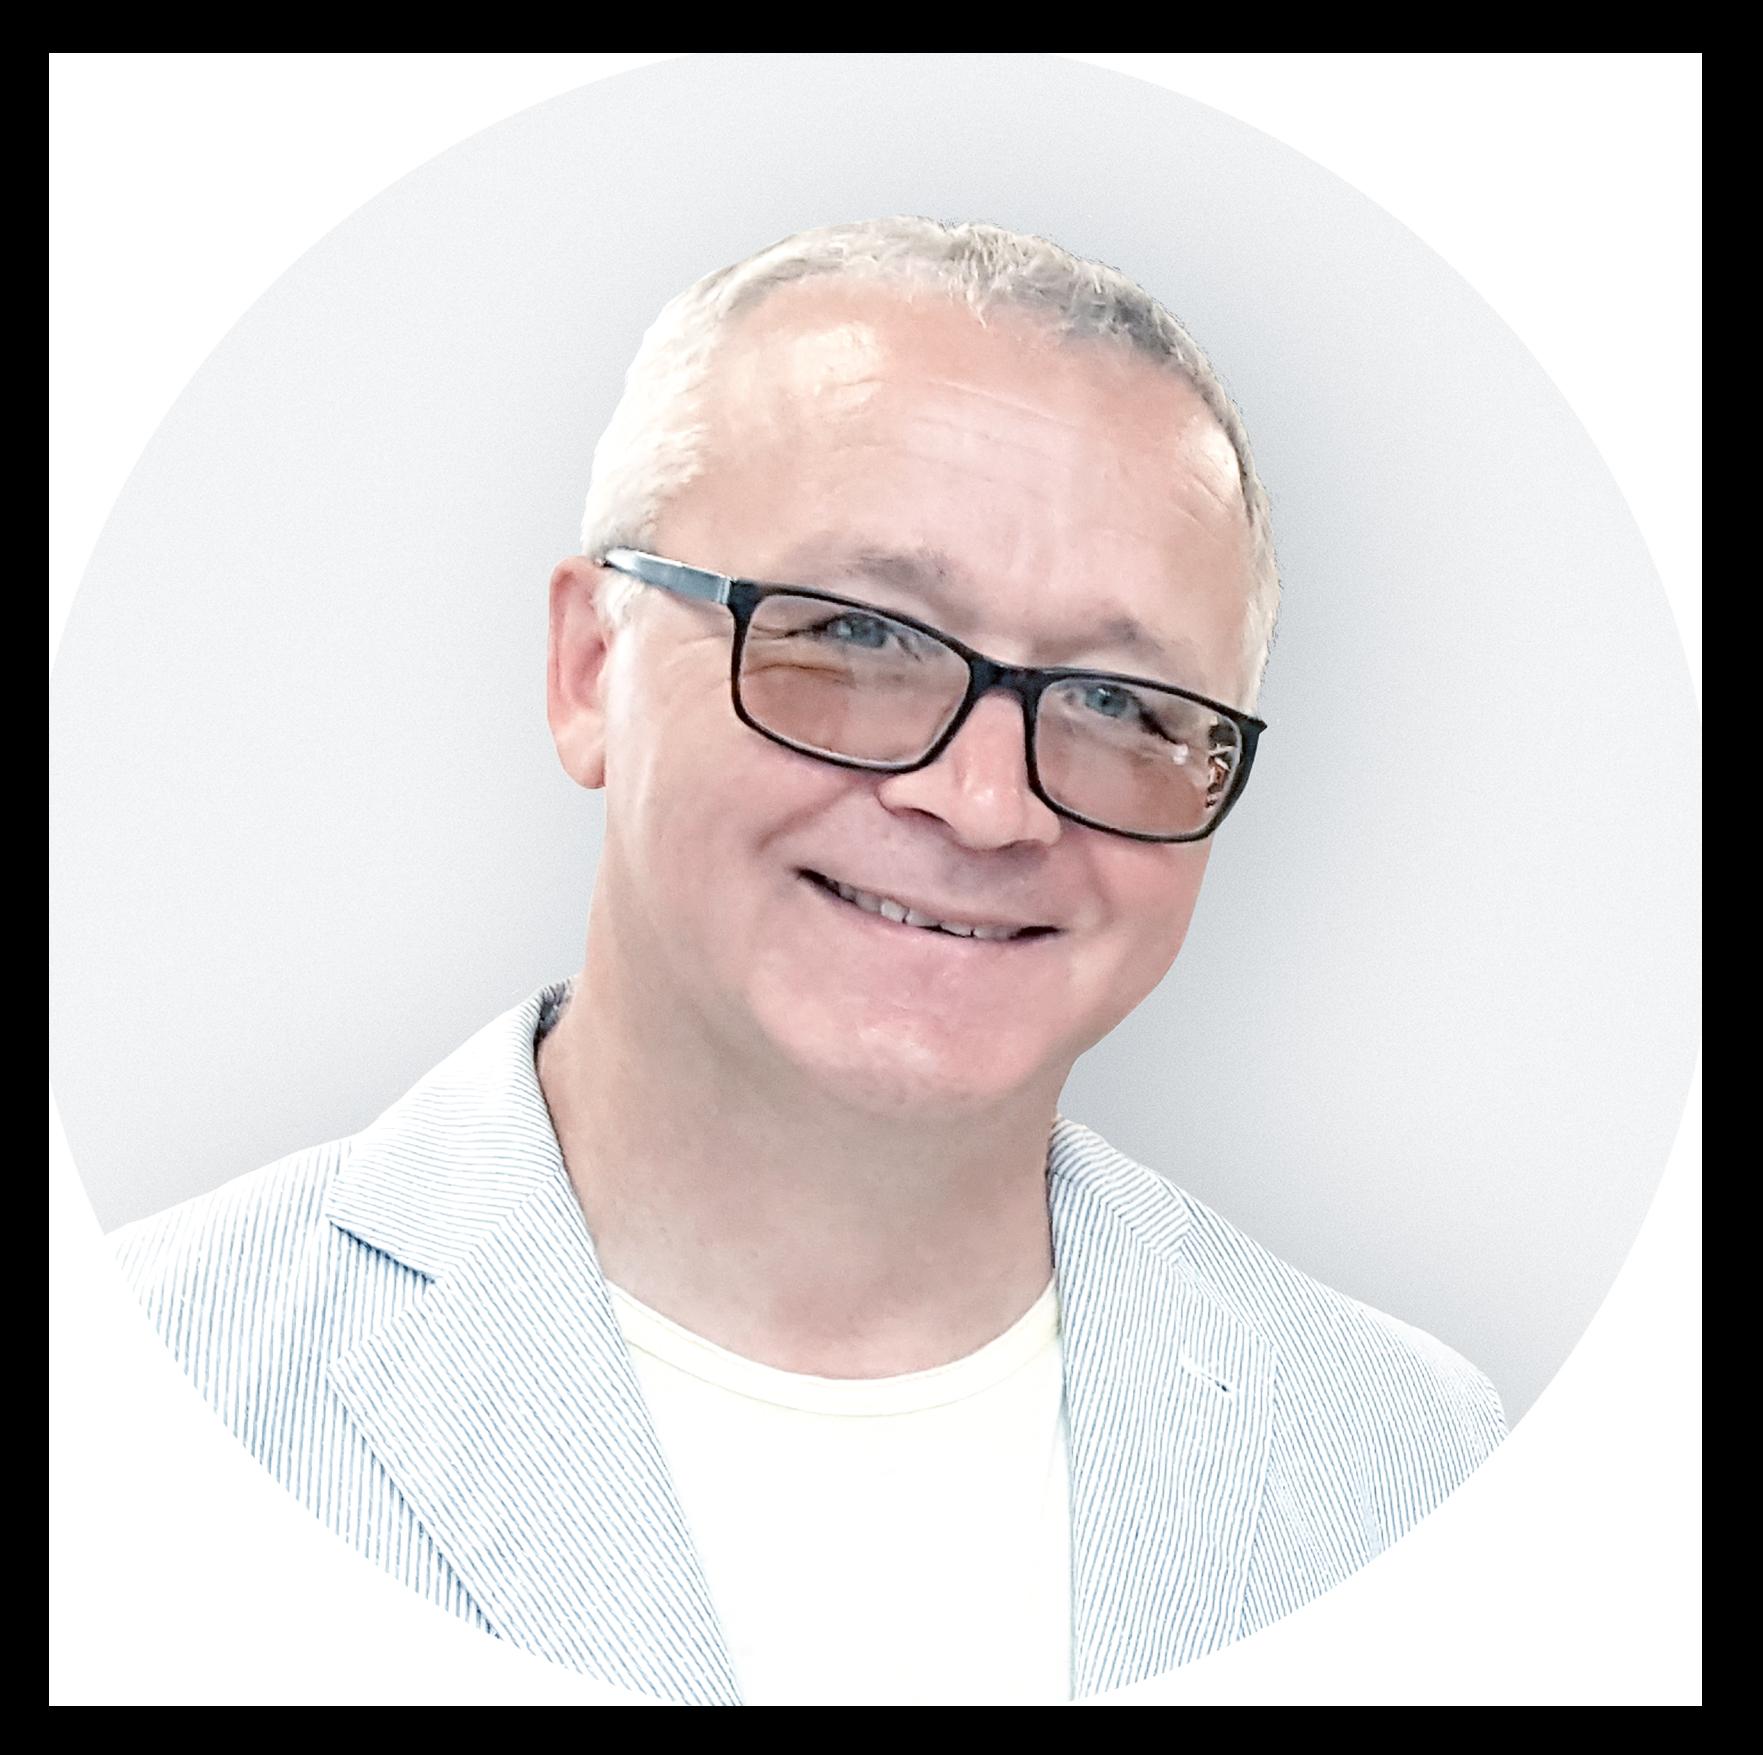 Директор по развитию компании Demmoksi Юрий Степченков